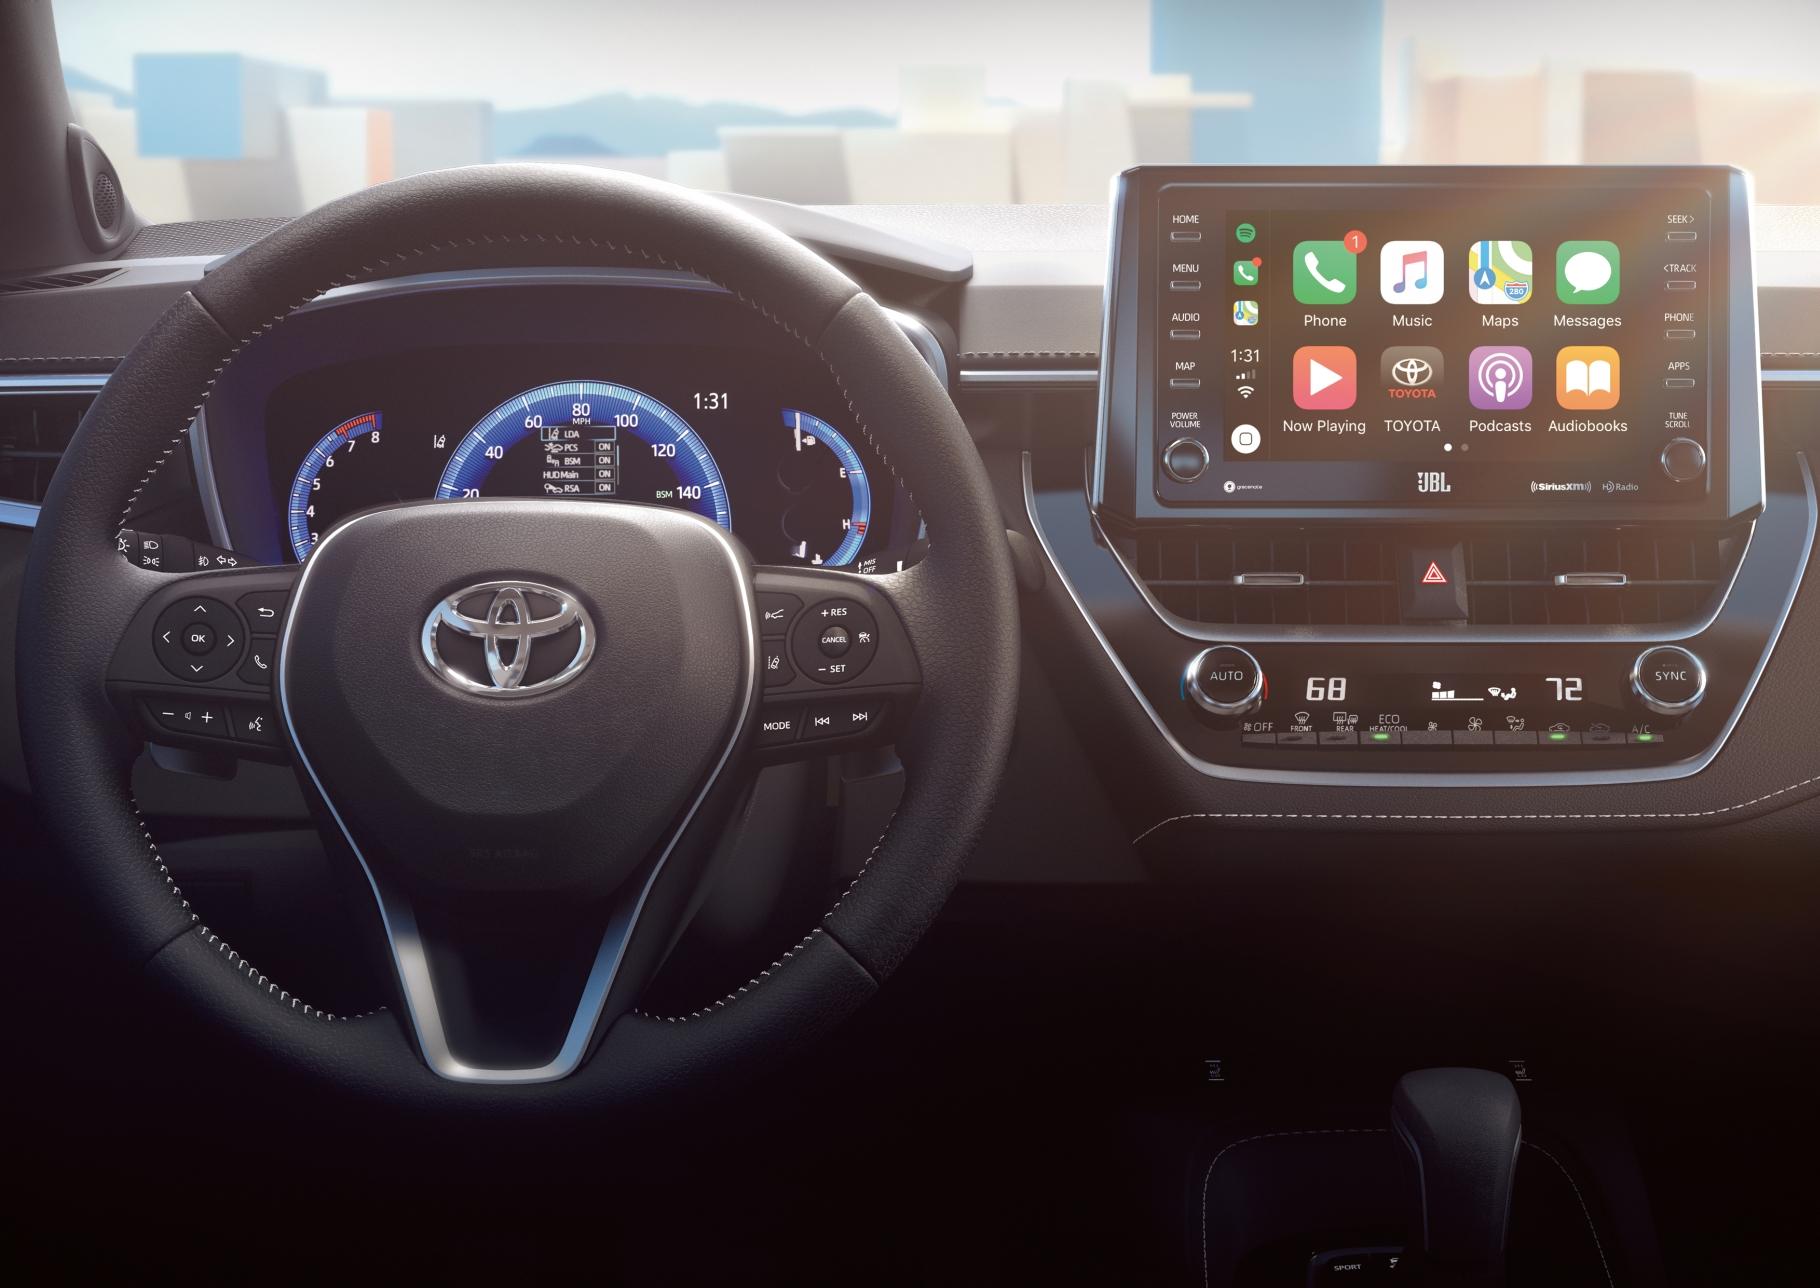 Toyota Corolla Usa My 2019 Erste Bilder Technik Ausstattung